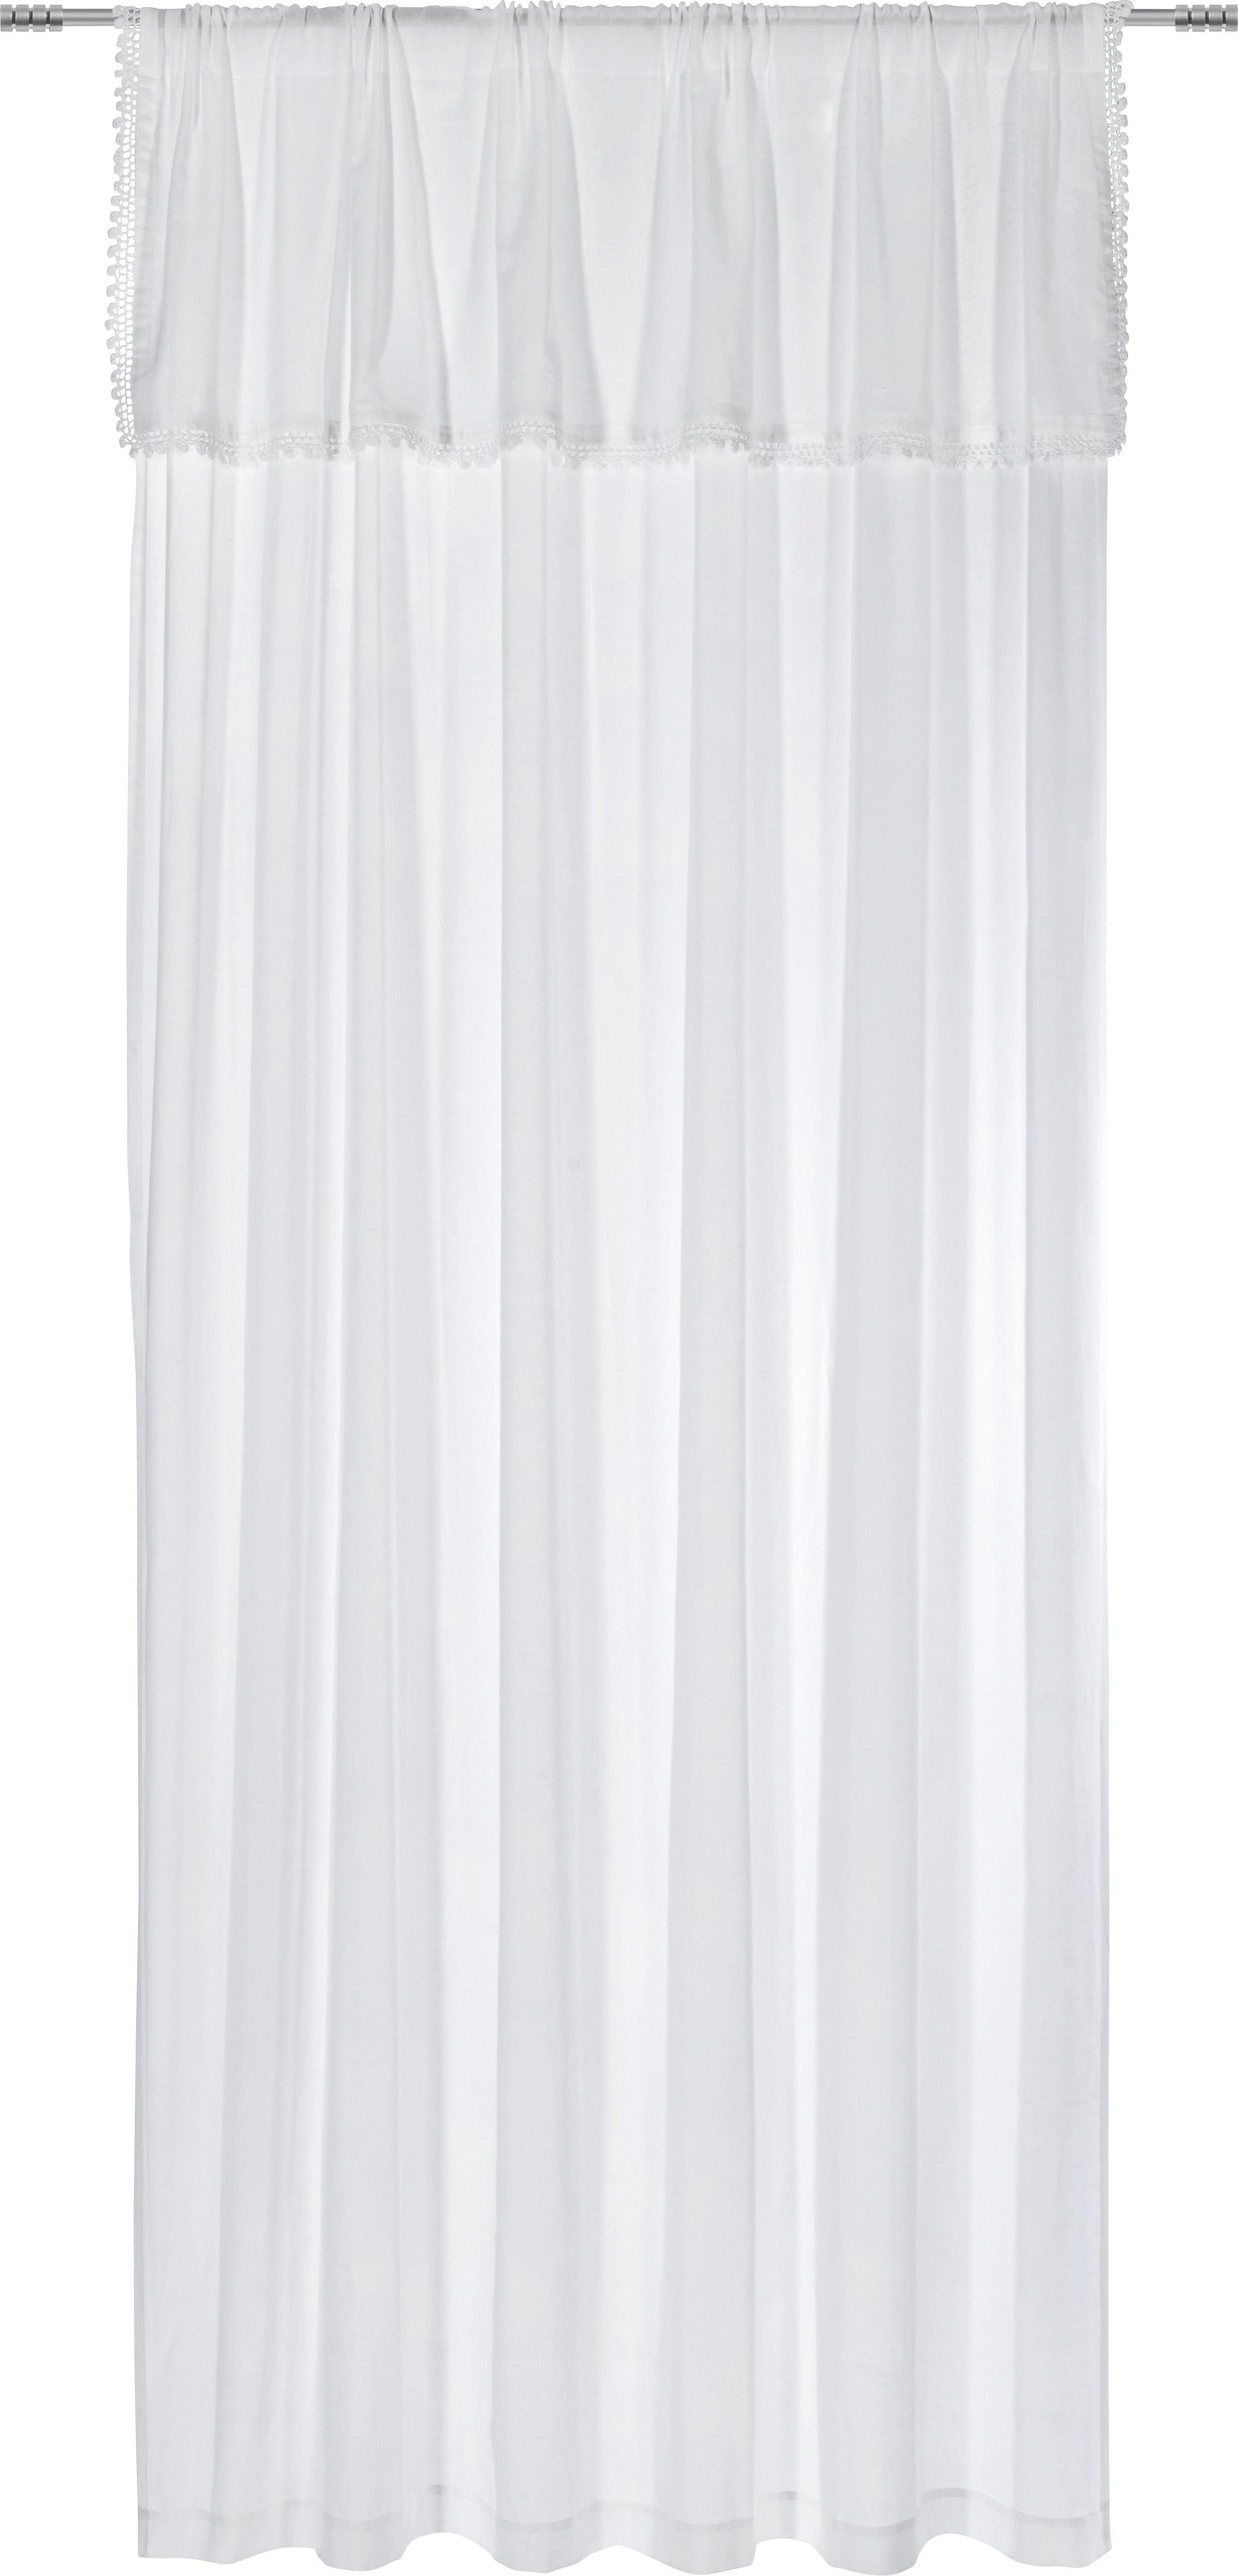 FERTIGVORHANG blickdicht - Weiß, MODERN, Textil (140/250cm) - LANDSCAPE